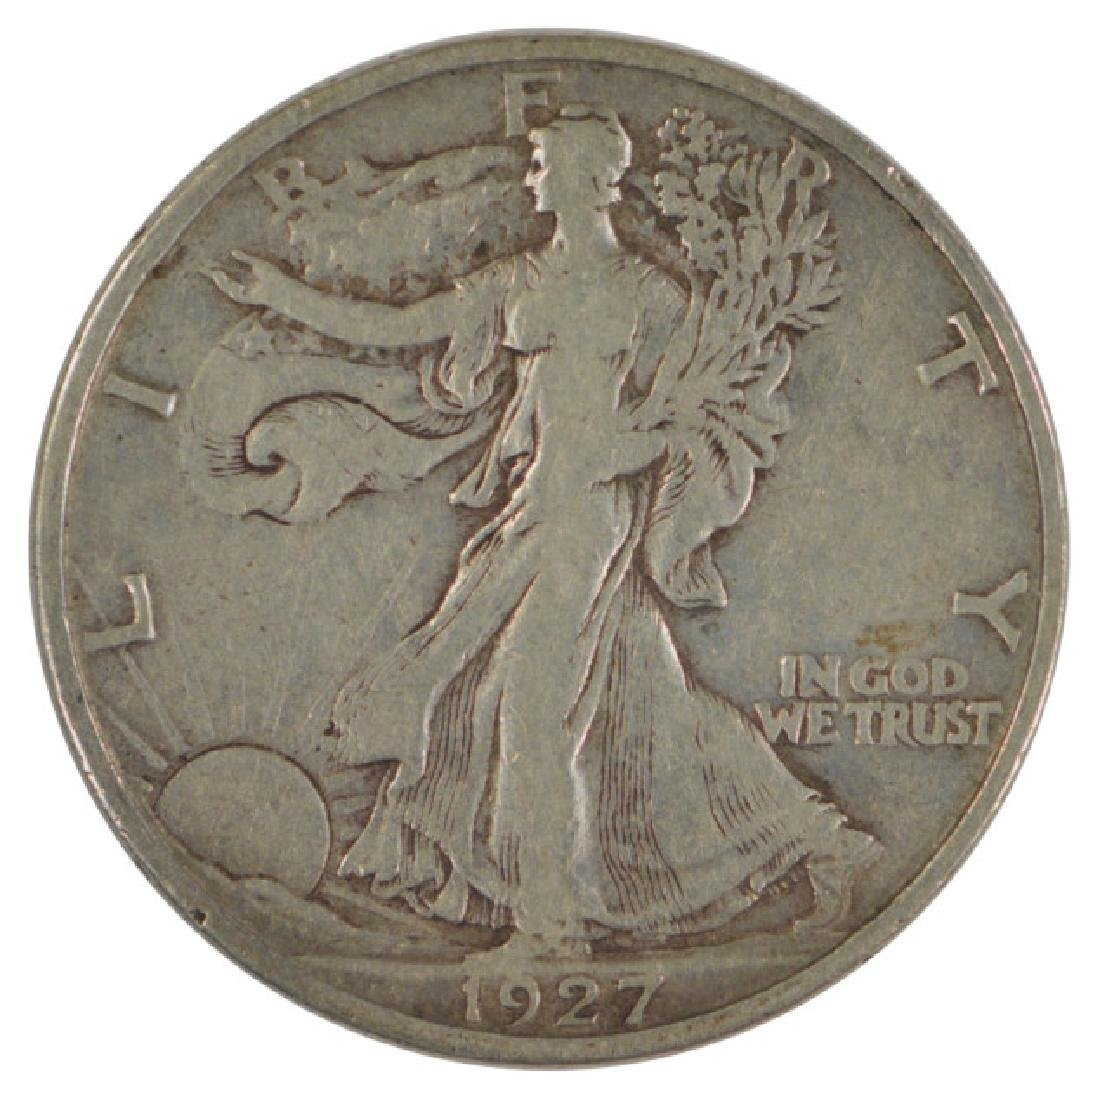 1927-S Walking Liberty Half Dollar Coin